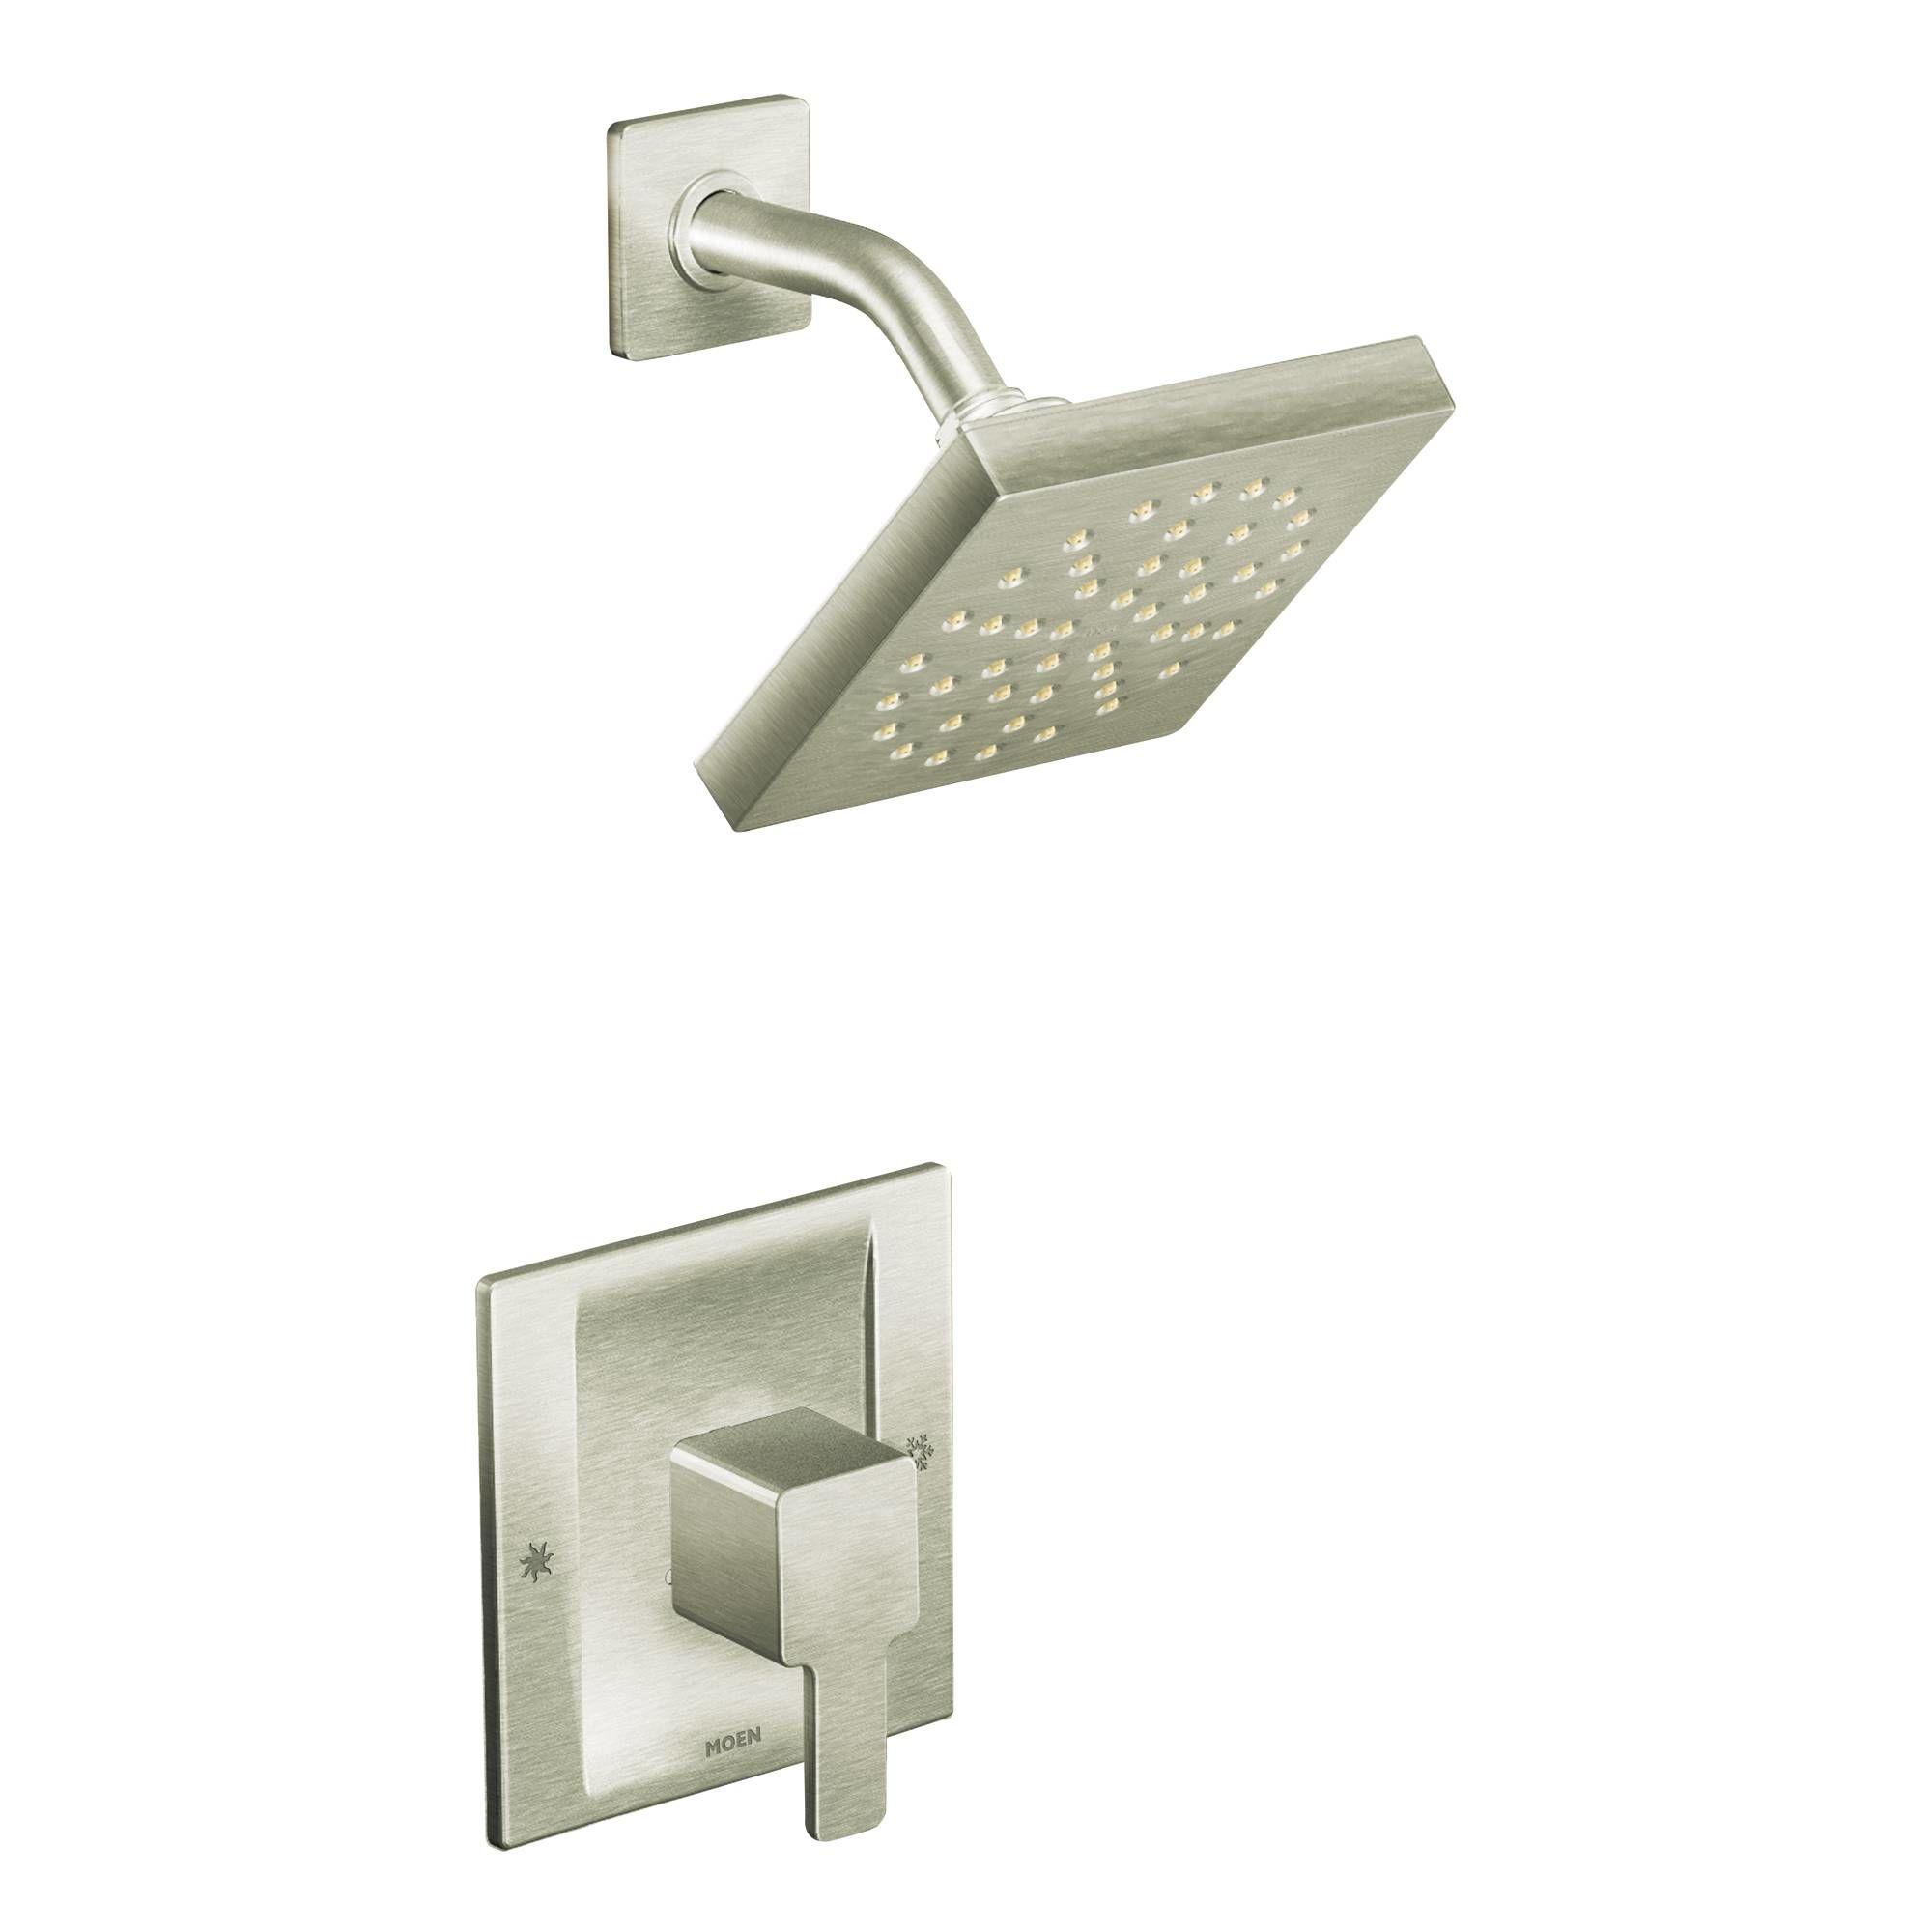 glass store vessel coupons square faucets bathroom direct wave luxury for fixtures decorative oceana faucet sink jsg cubix sinks plumbing